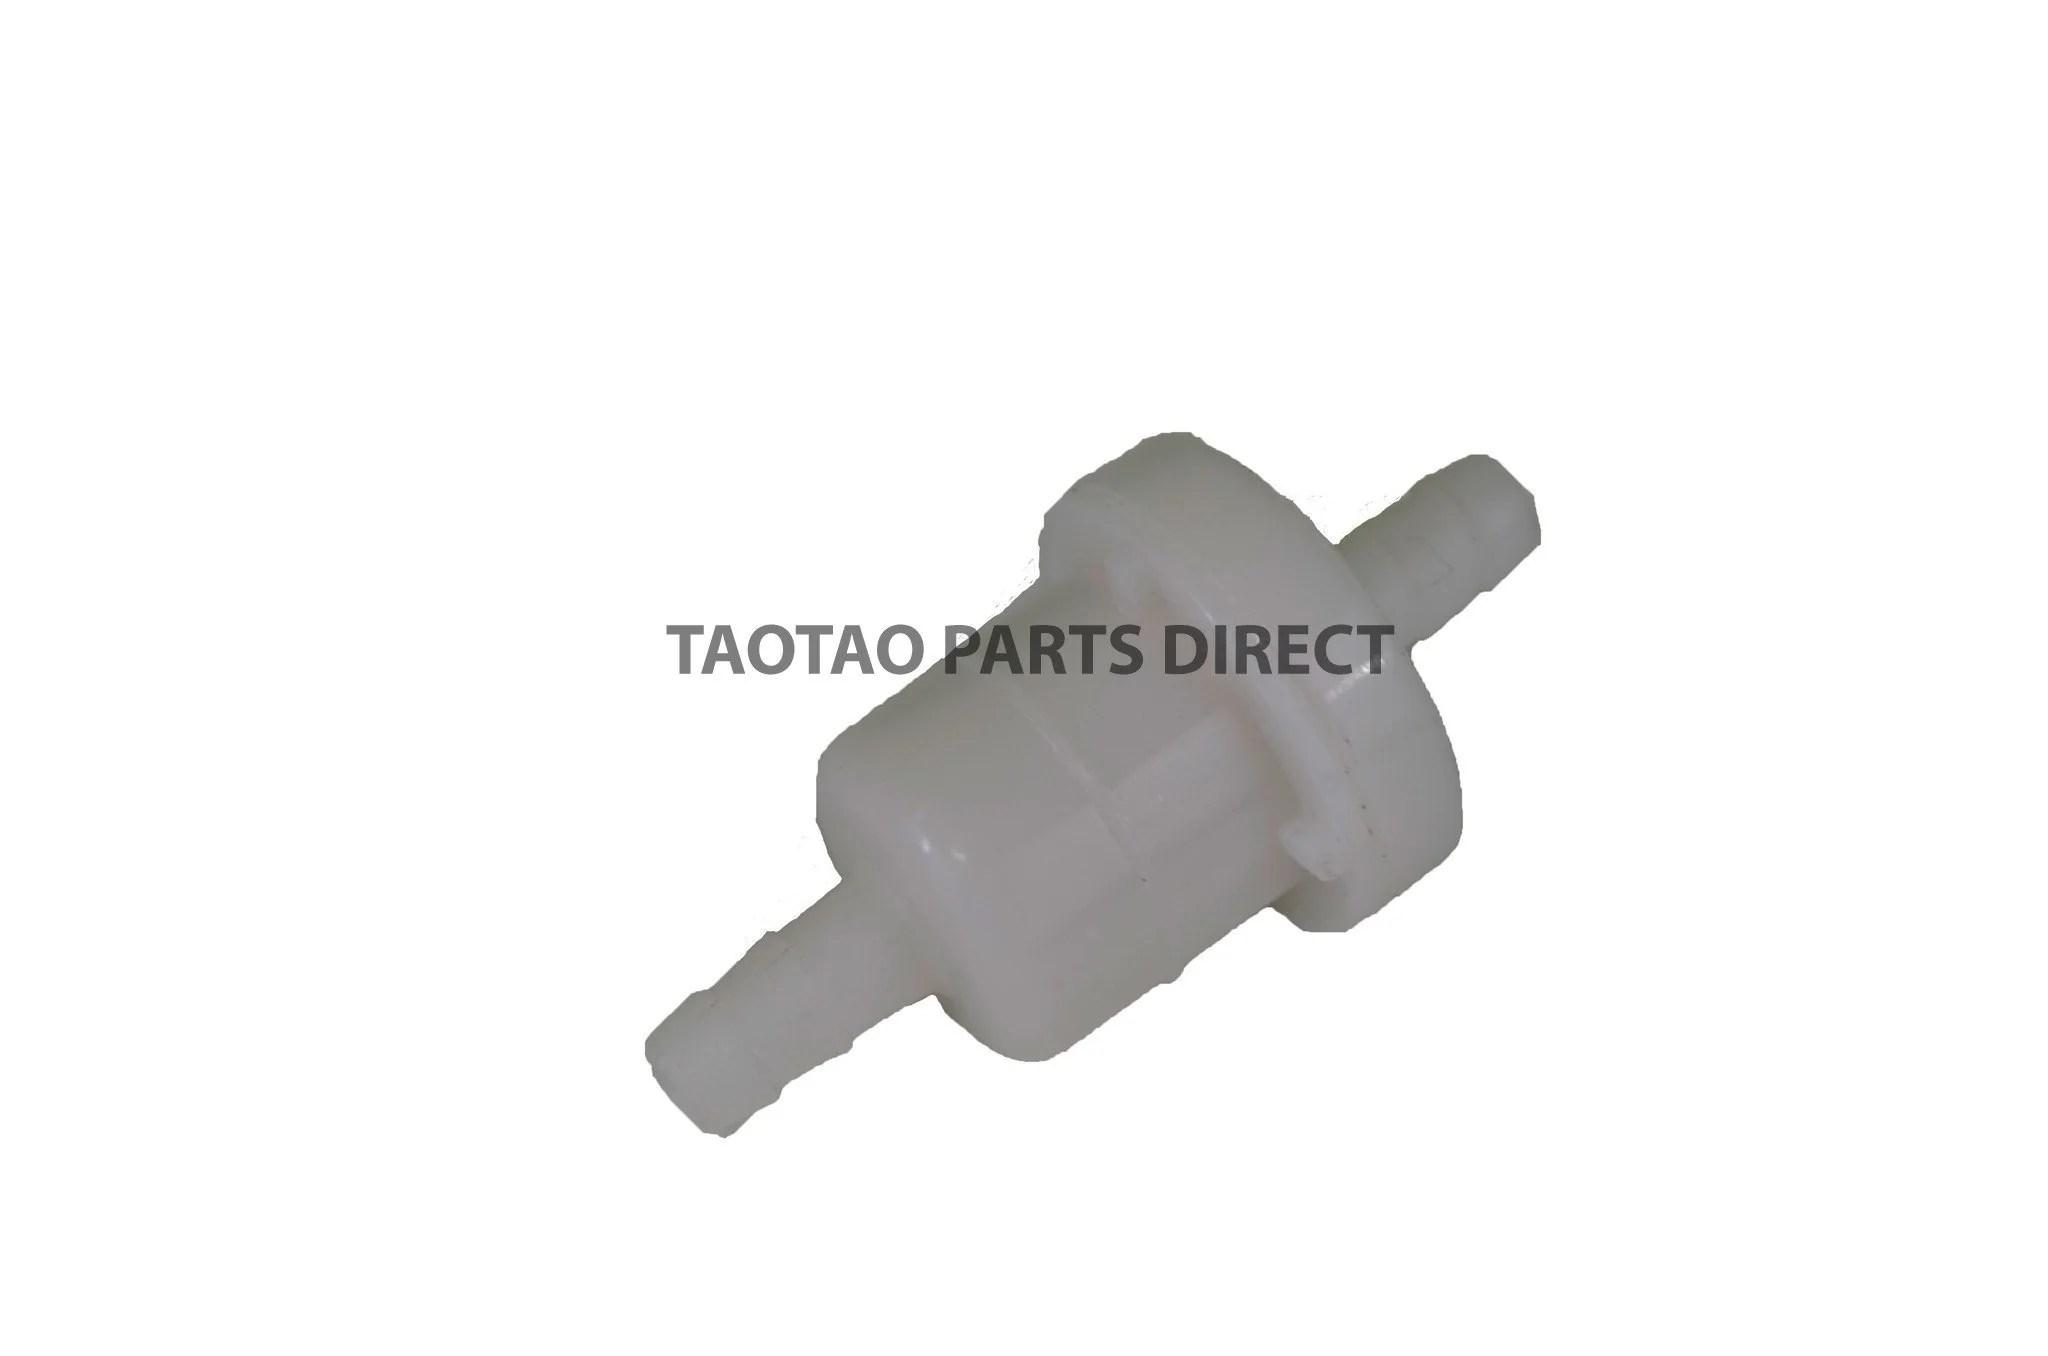 premium fuel filter for taotao powersports machines taotao parts direct [ 2048 x 1356 Pixel ]